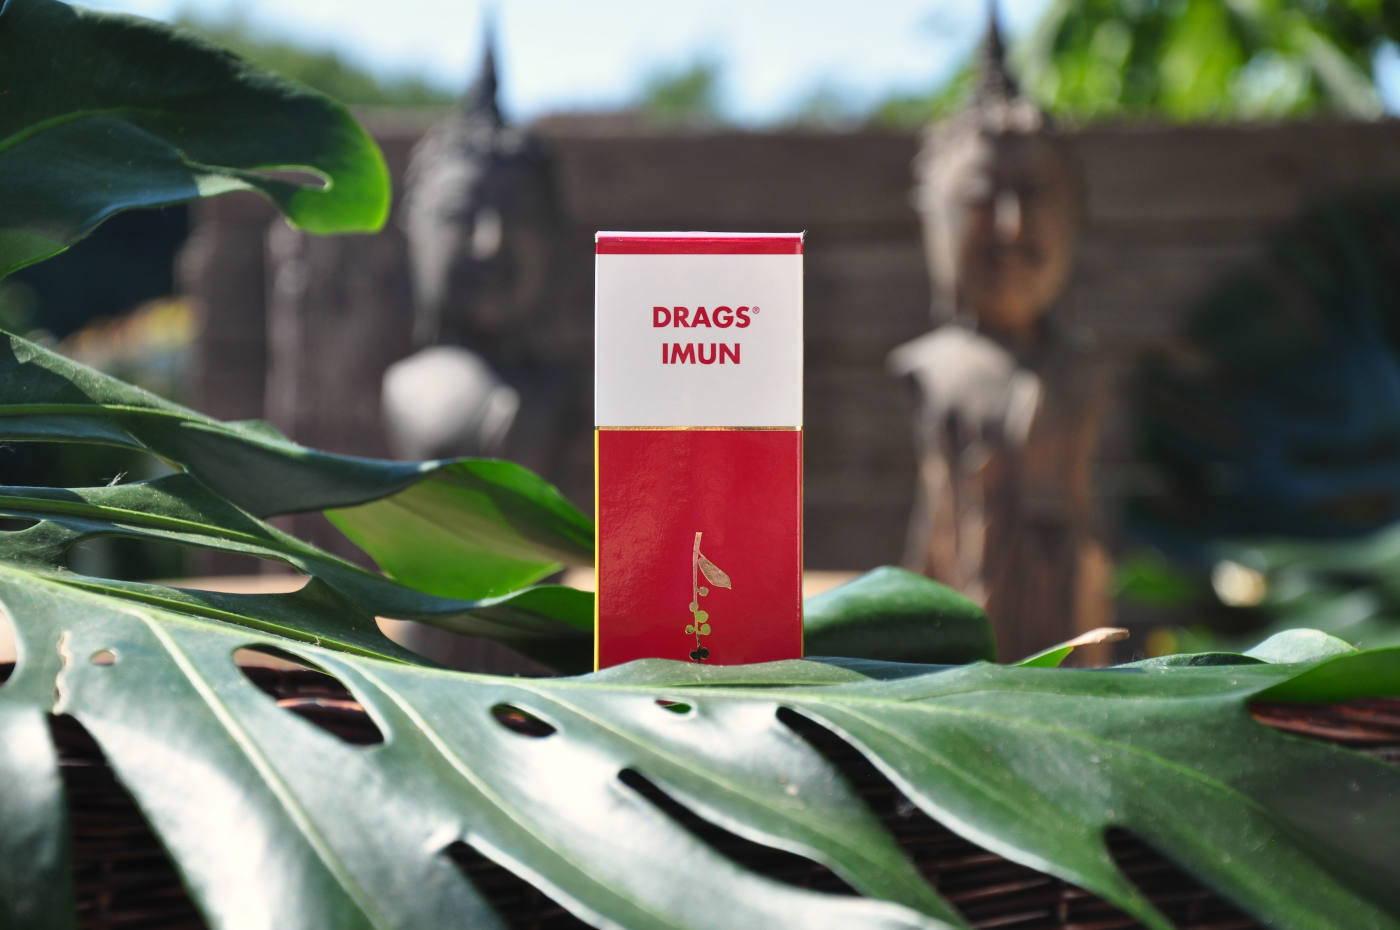 DRAGS IMUN 100% Croton-Lechleri-BAUMHARZ croton lechleri DRACHENBAUM Drachenblut Immunsystem OPC